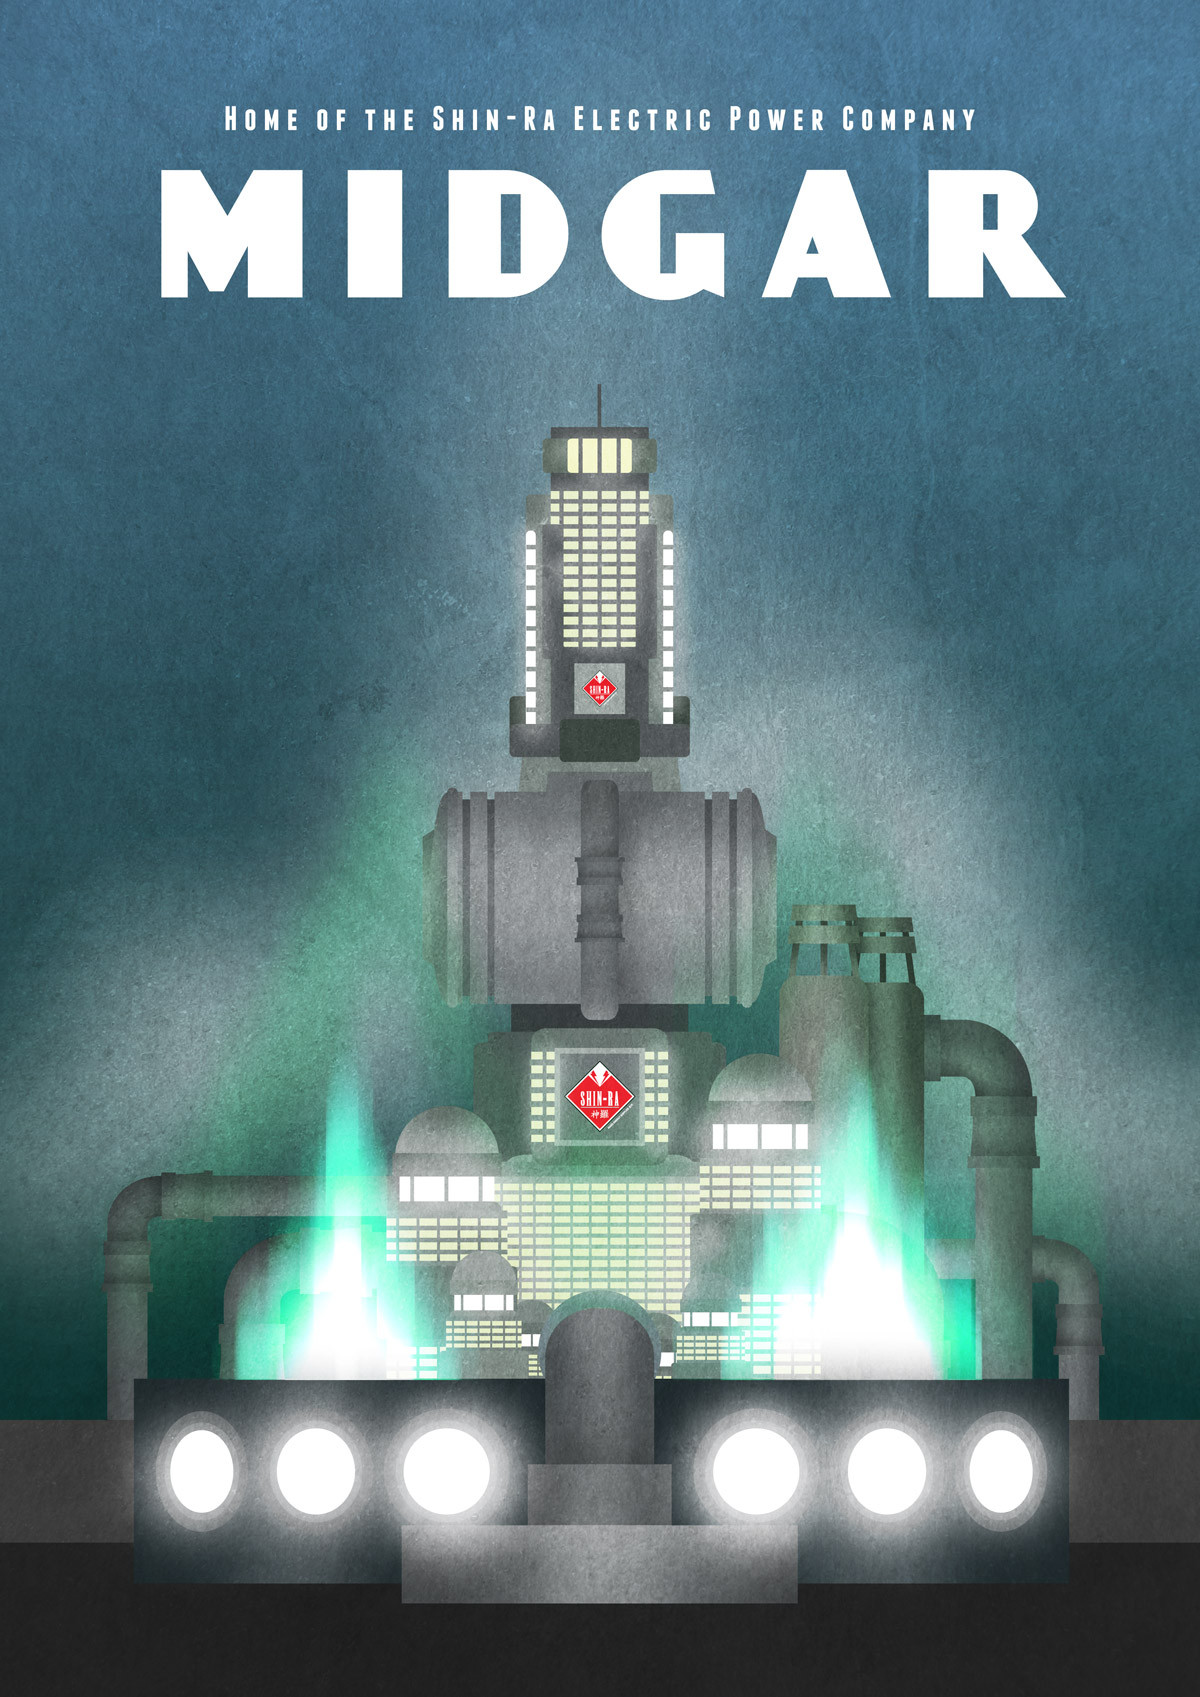 midgar-final-fantasy-vii-travel-posters_1